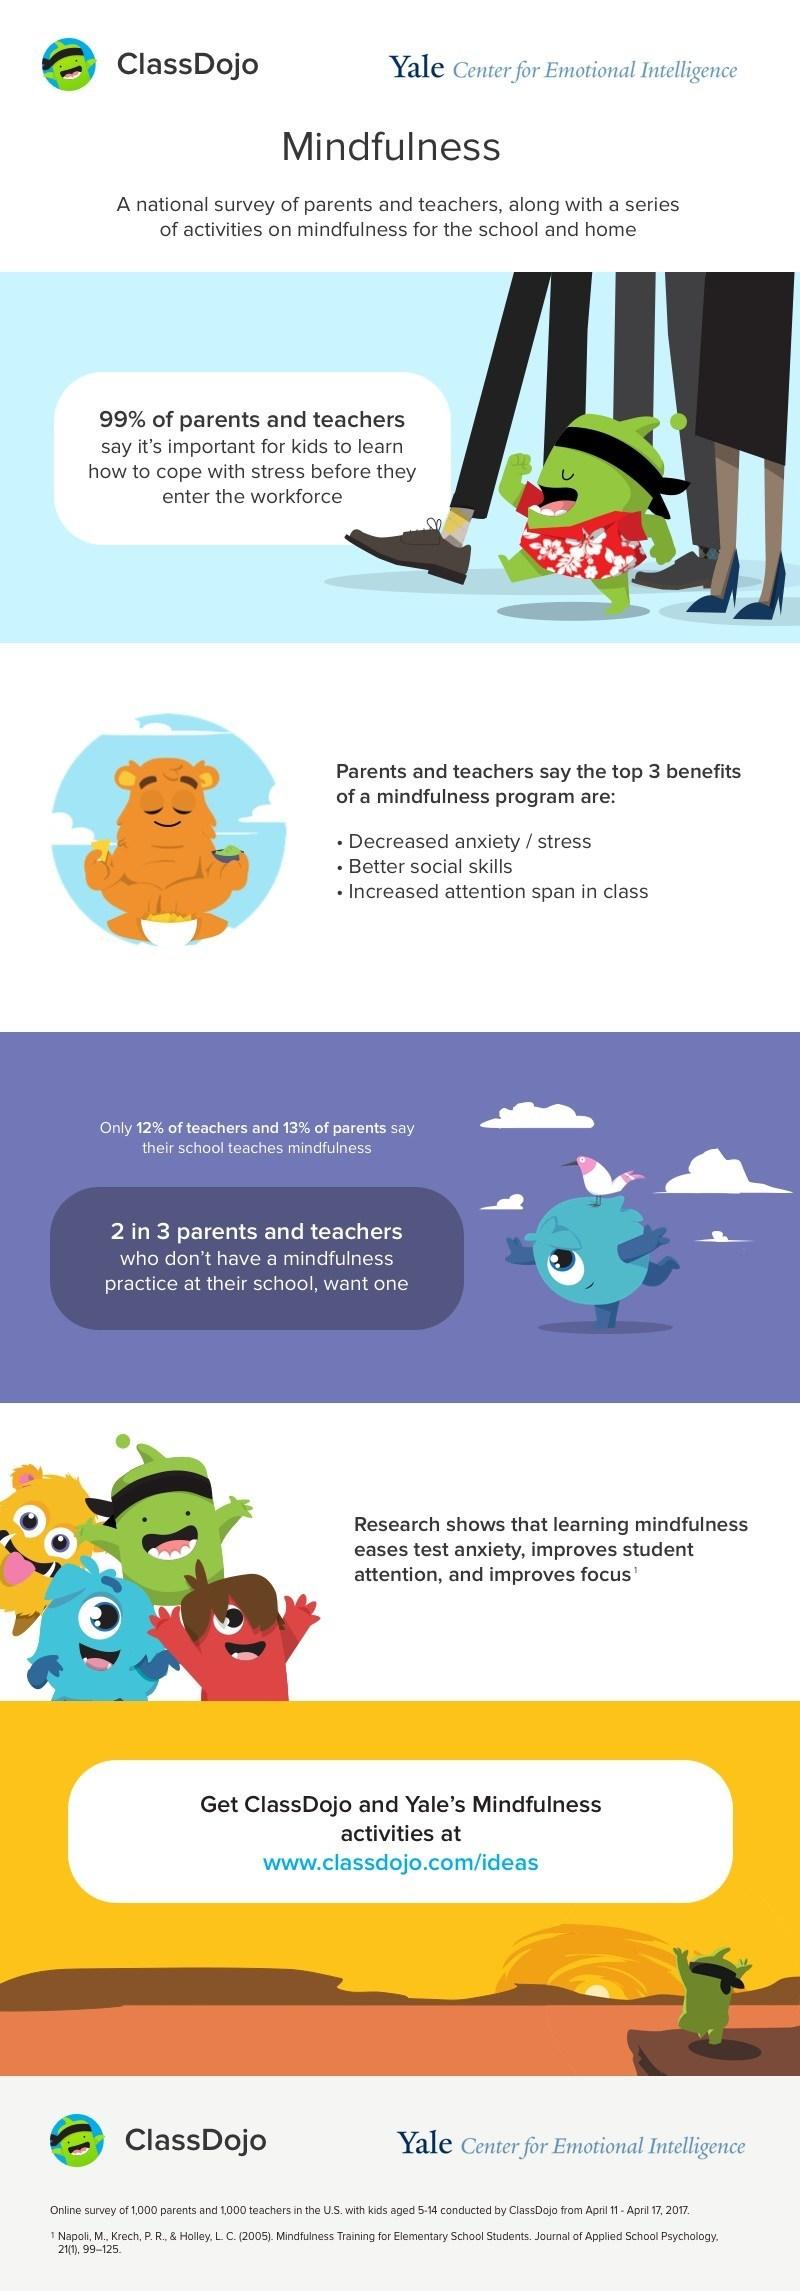 Results from the ClassDojo & Yale Center for Emotional Intelligence Mindfulness survey